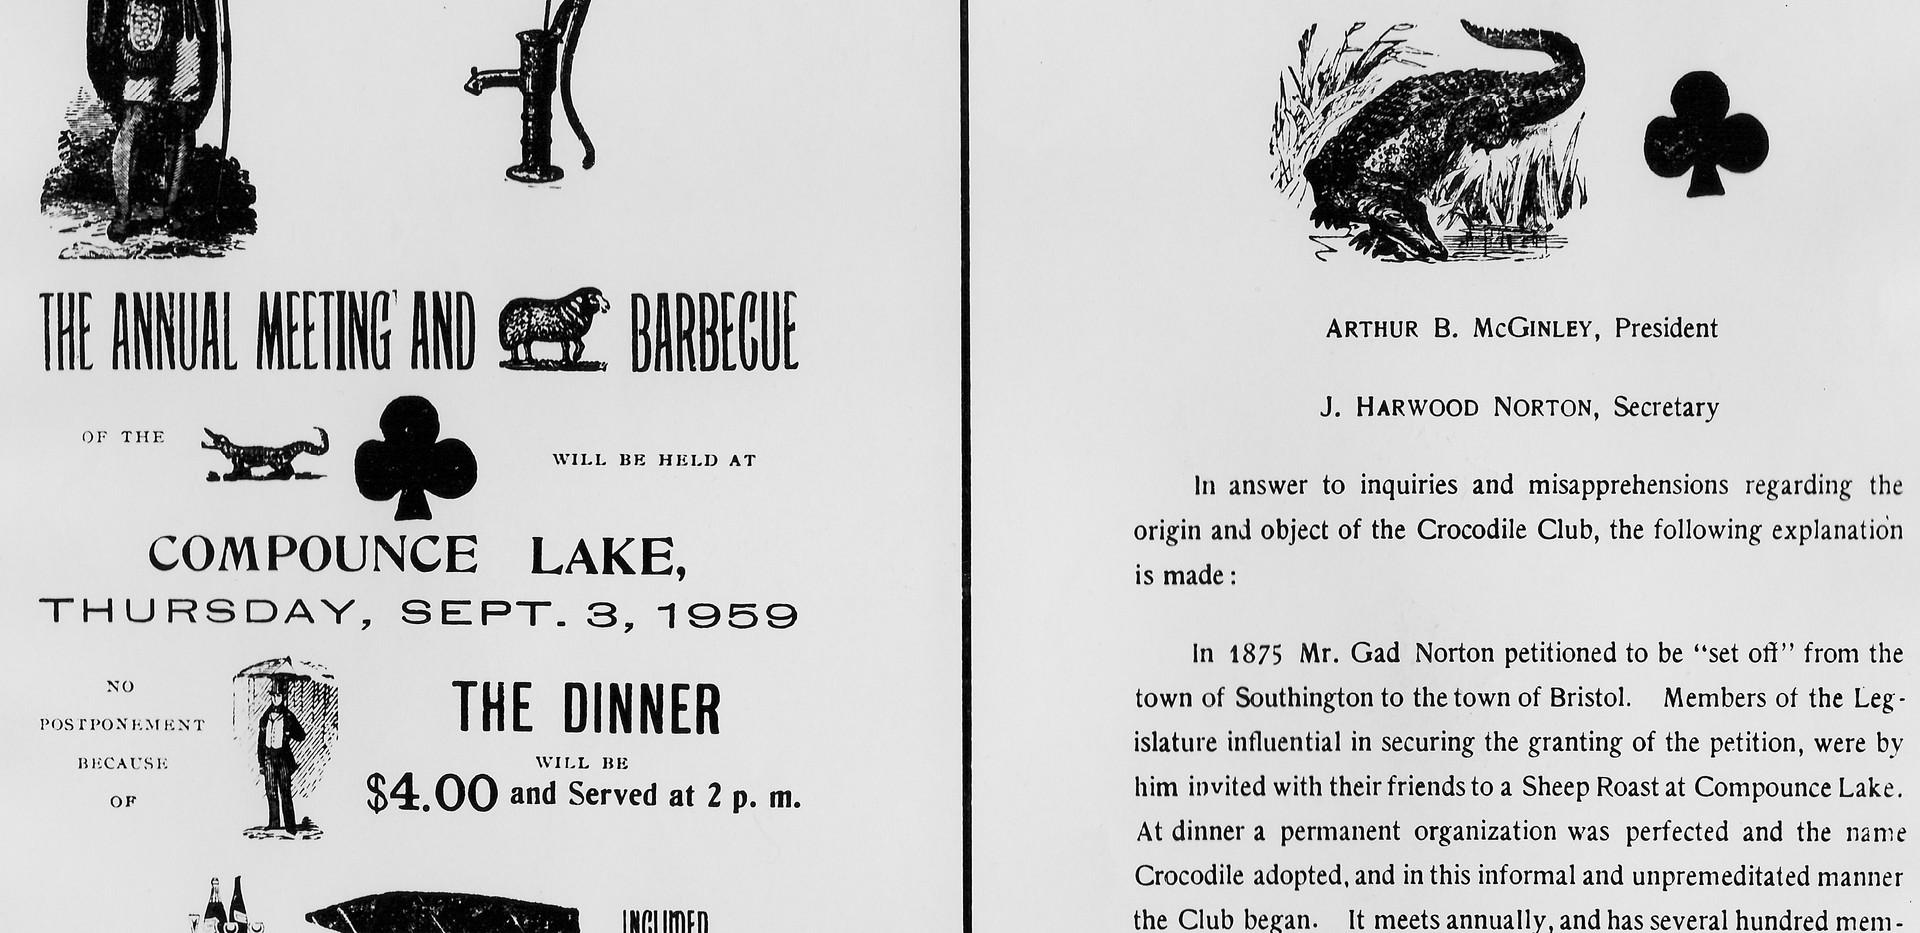 Croc Invitation 1959.jpg